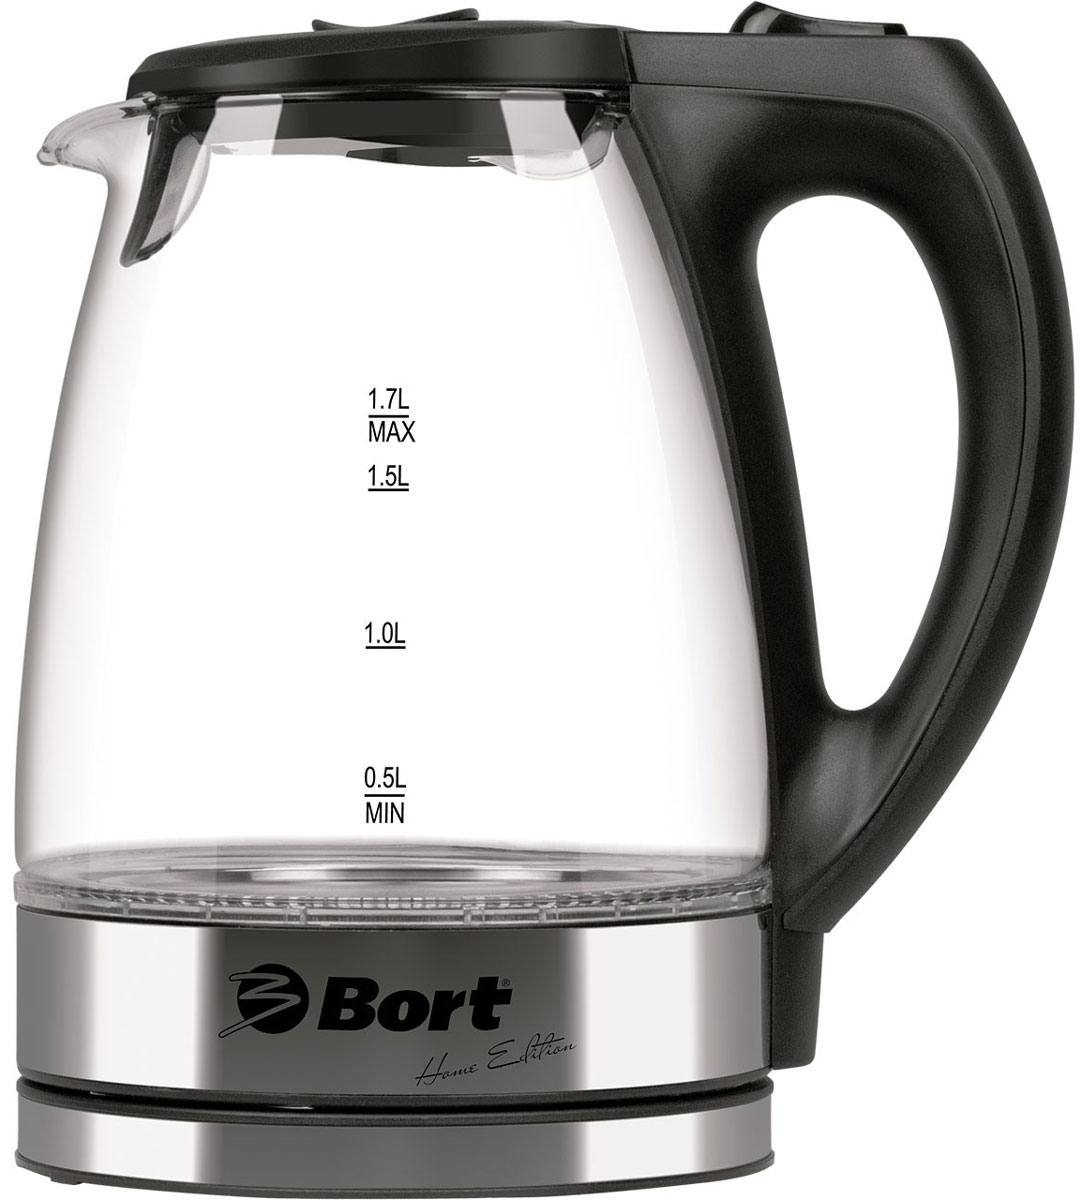 Bort BWK-2217G электрический чайник чайник электрический bort bwk 2117m